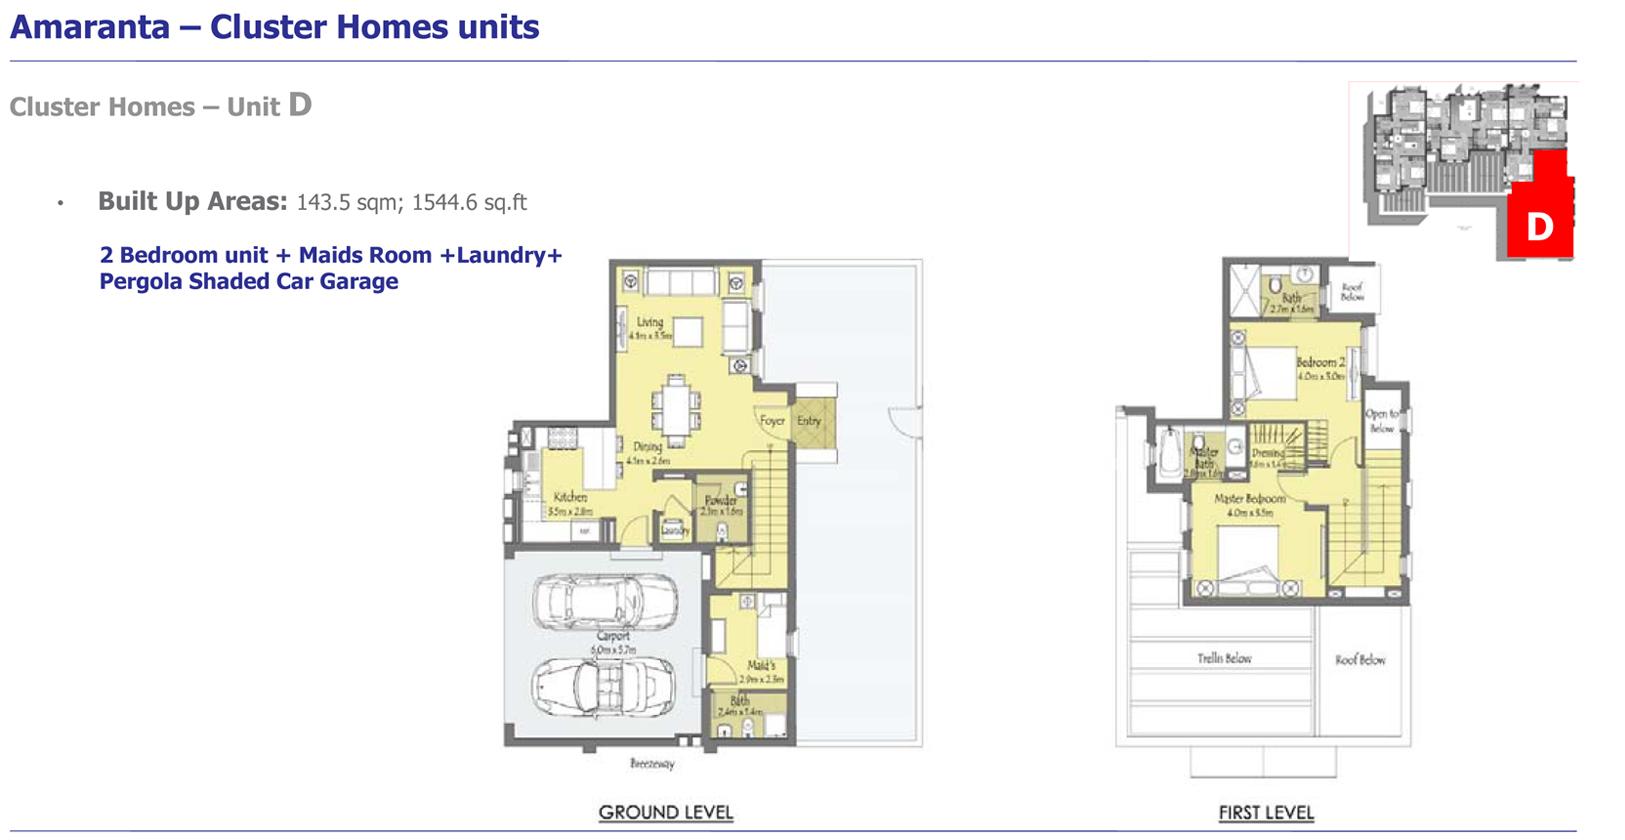 Phase 3 - Cluster Homes – Unit D